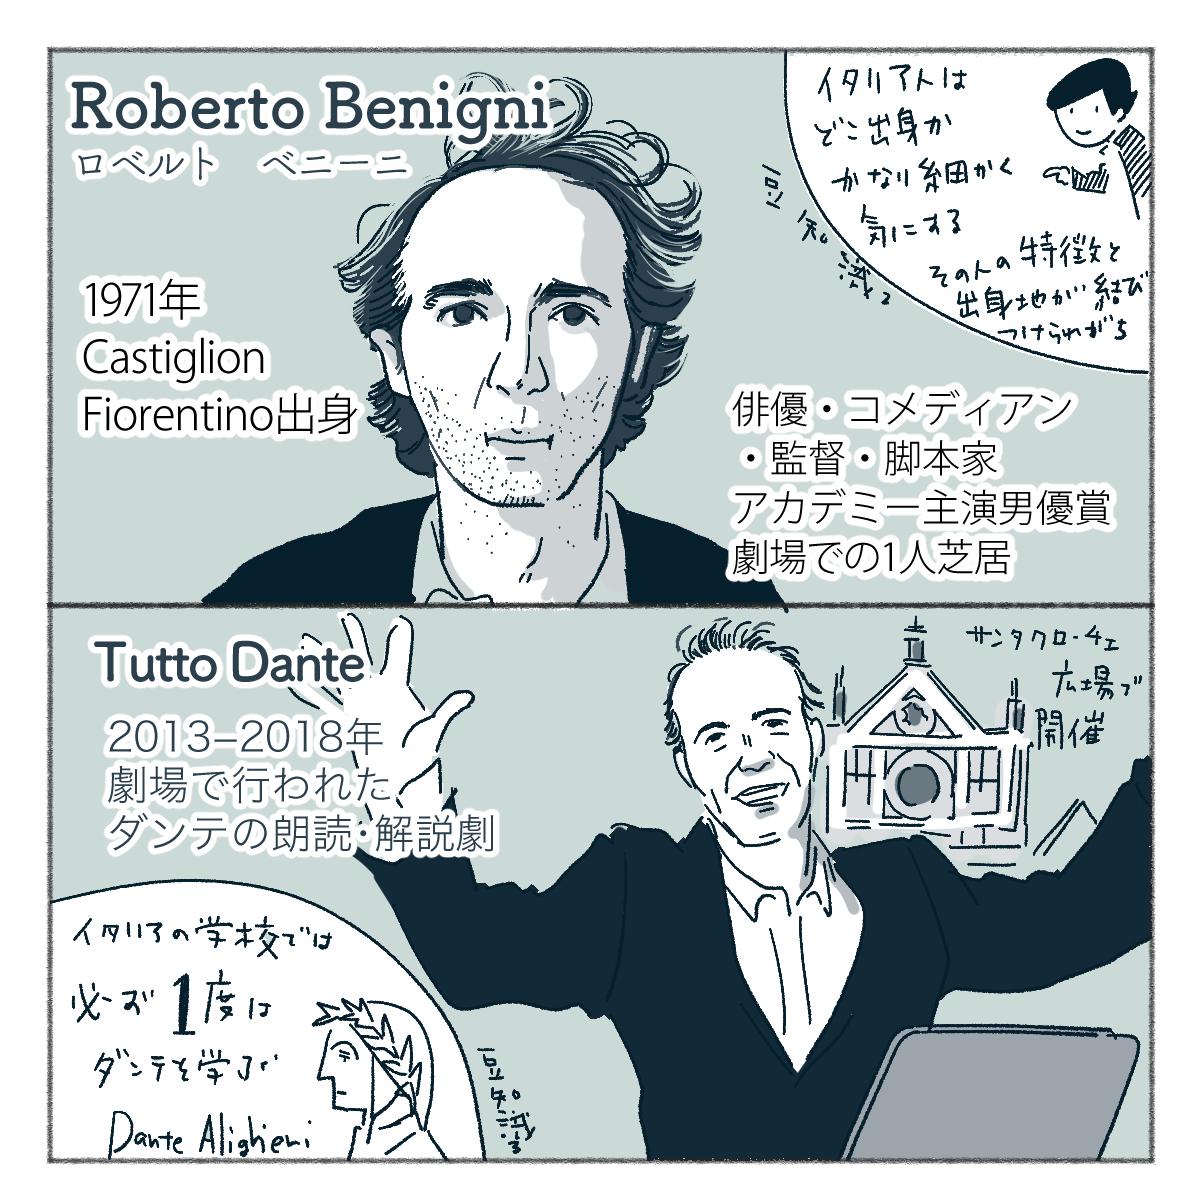 Roberto Benigni ロベルトベニーニについて説明したイラスト